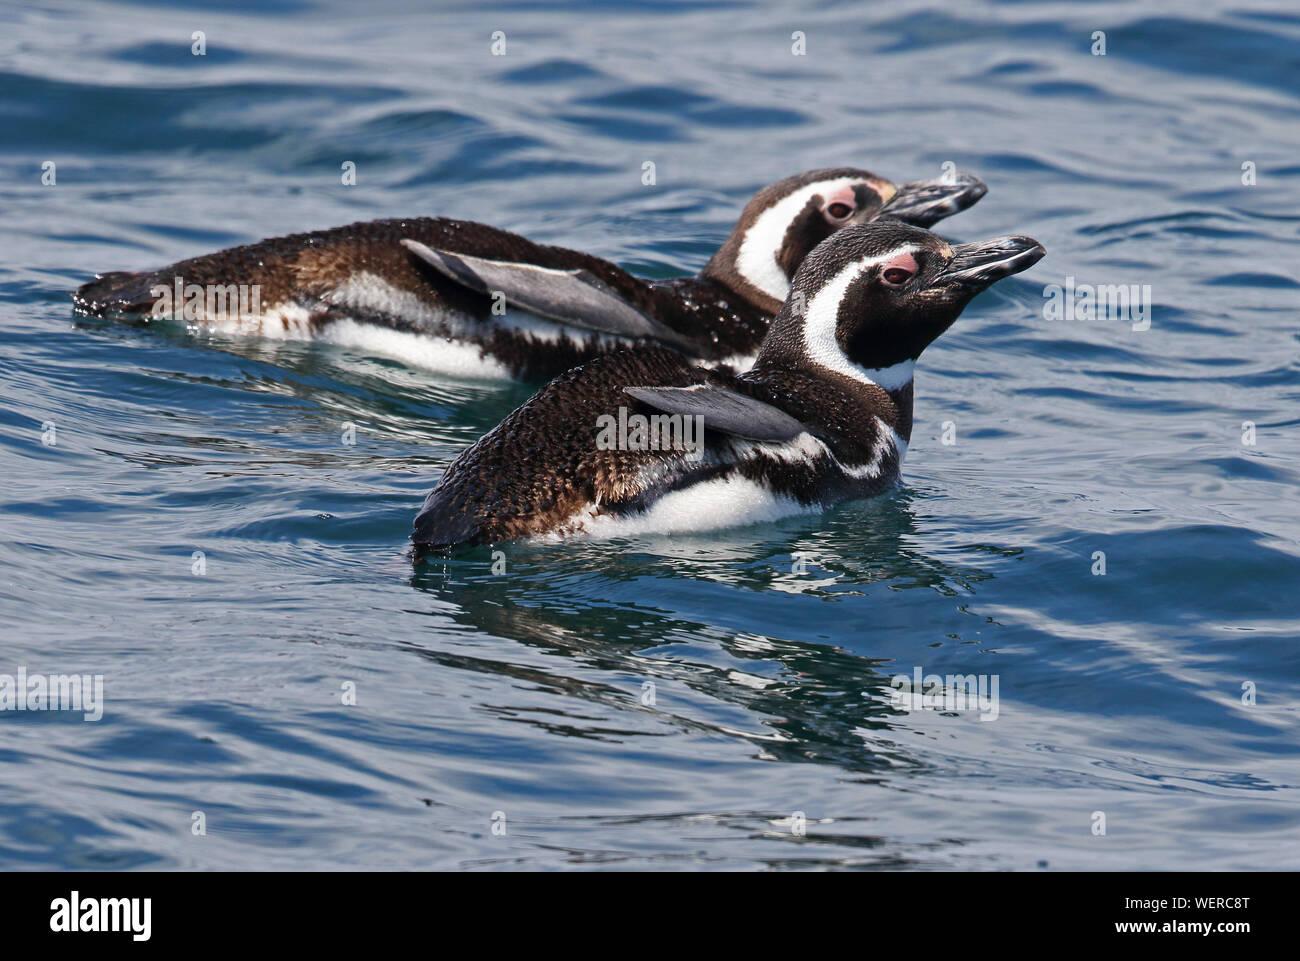 Magellanic Penguin (Spheniscus magellanicus) two adults swimming in sea  Puerto Montt, Chile             January Stock Photo